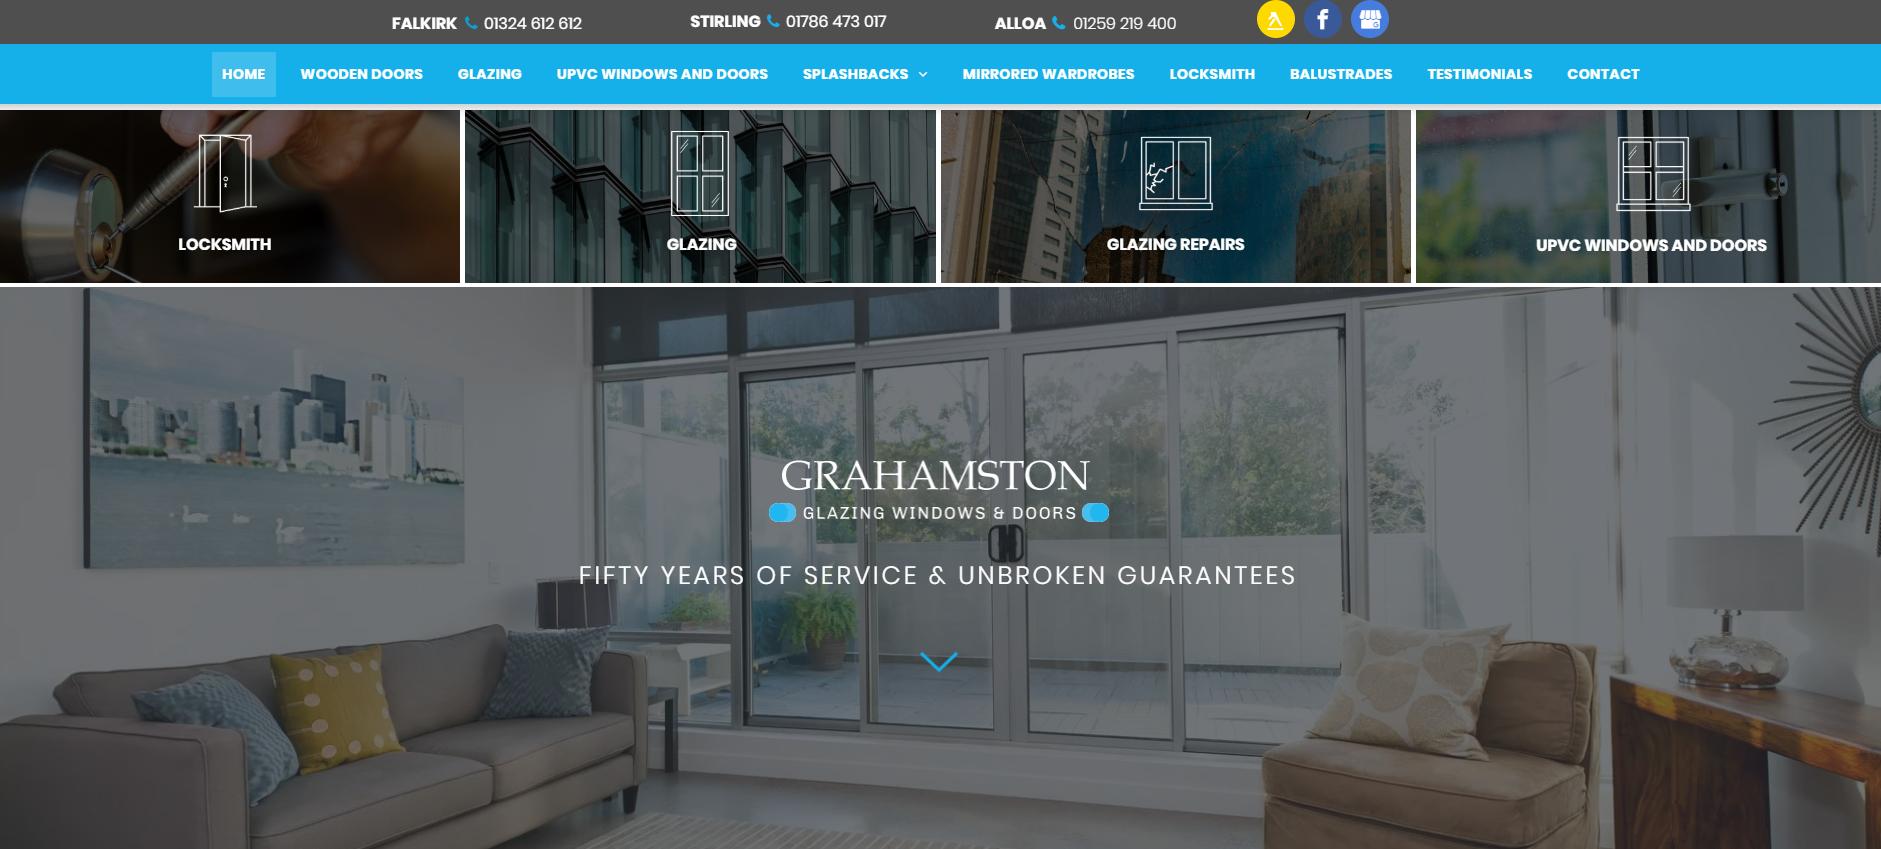 Grahamston Glazing Co Ltd